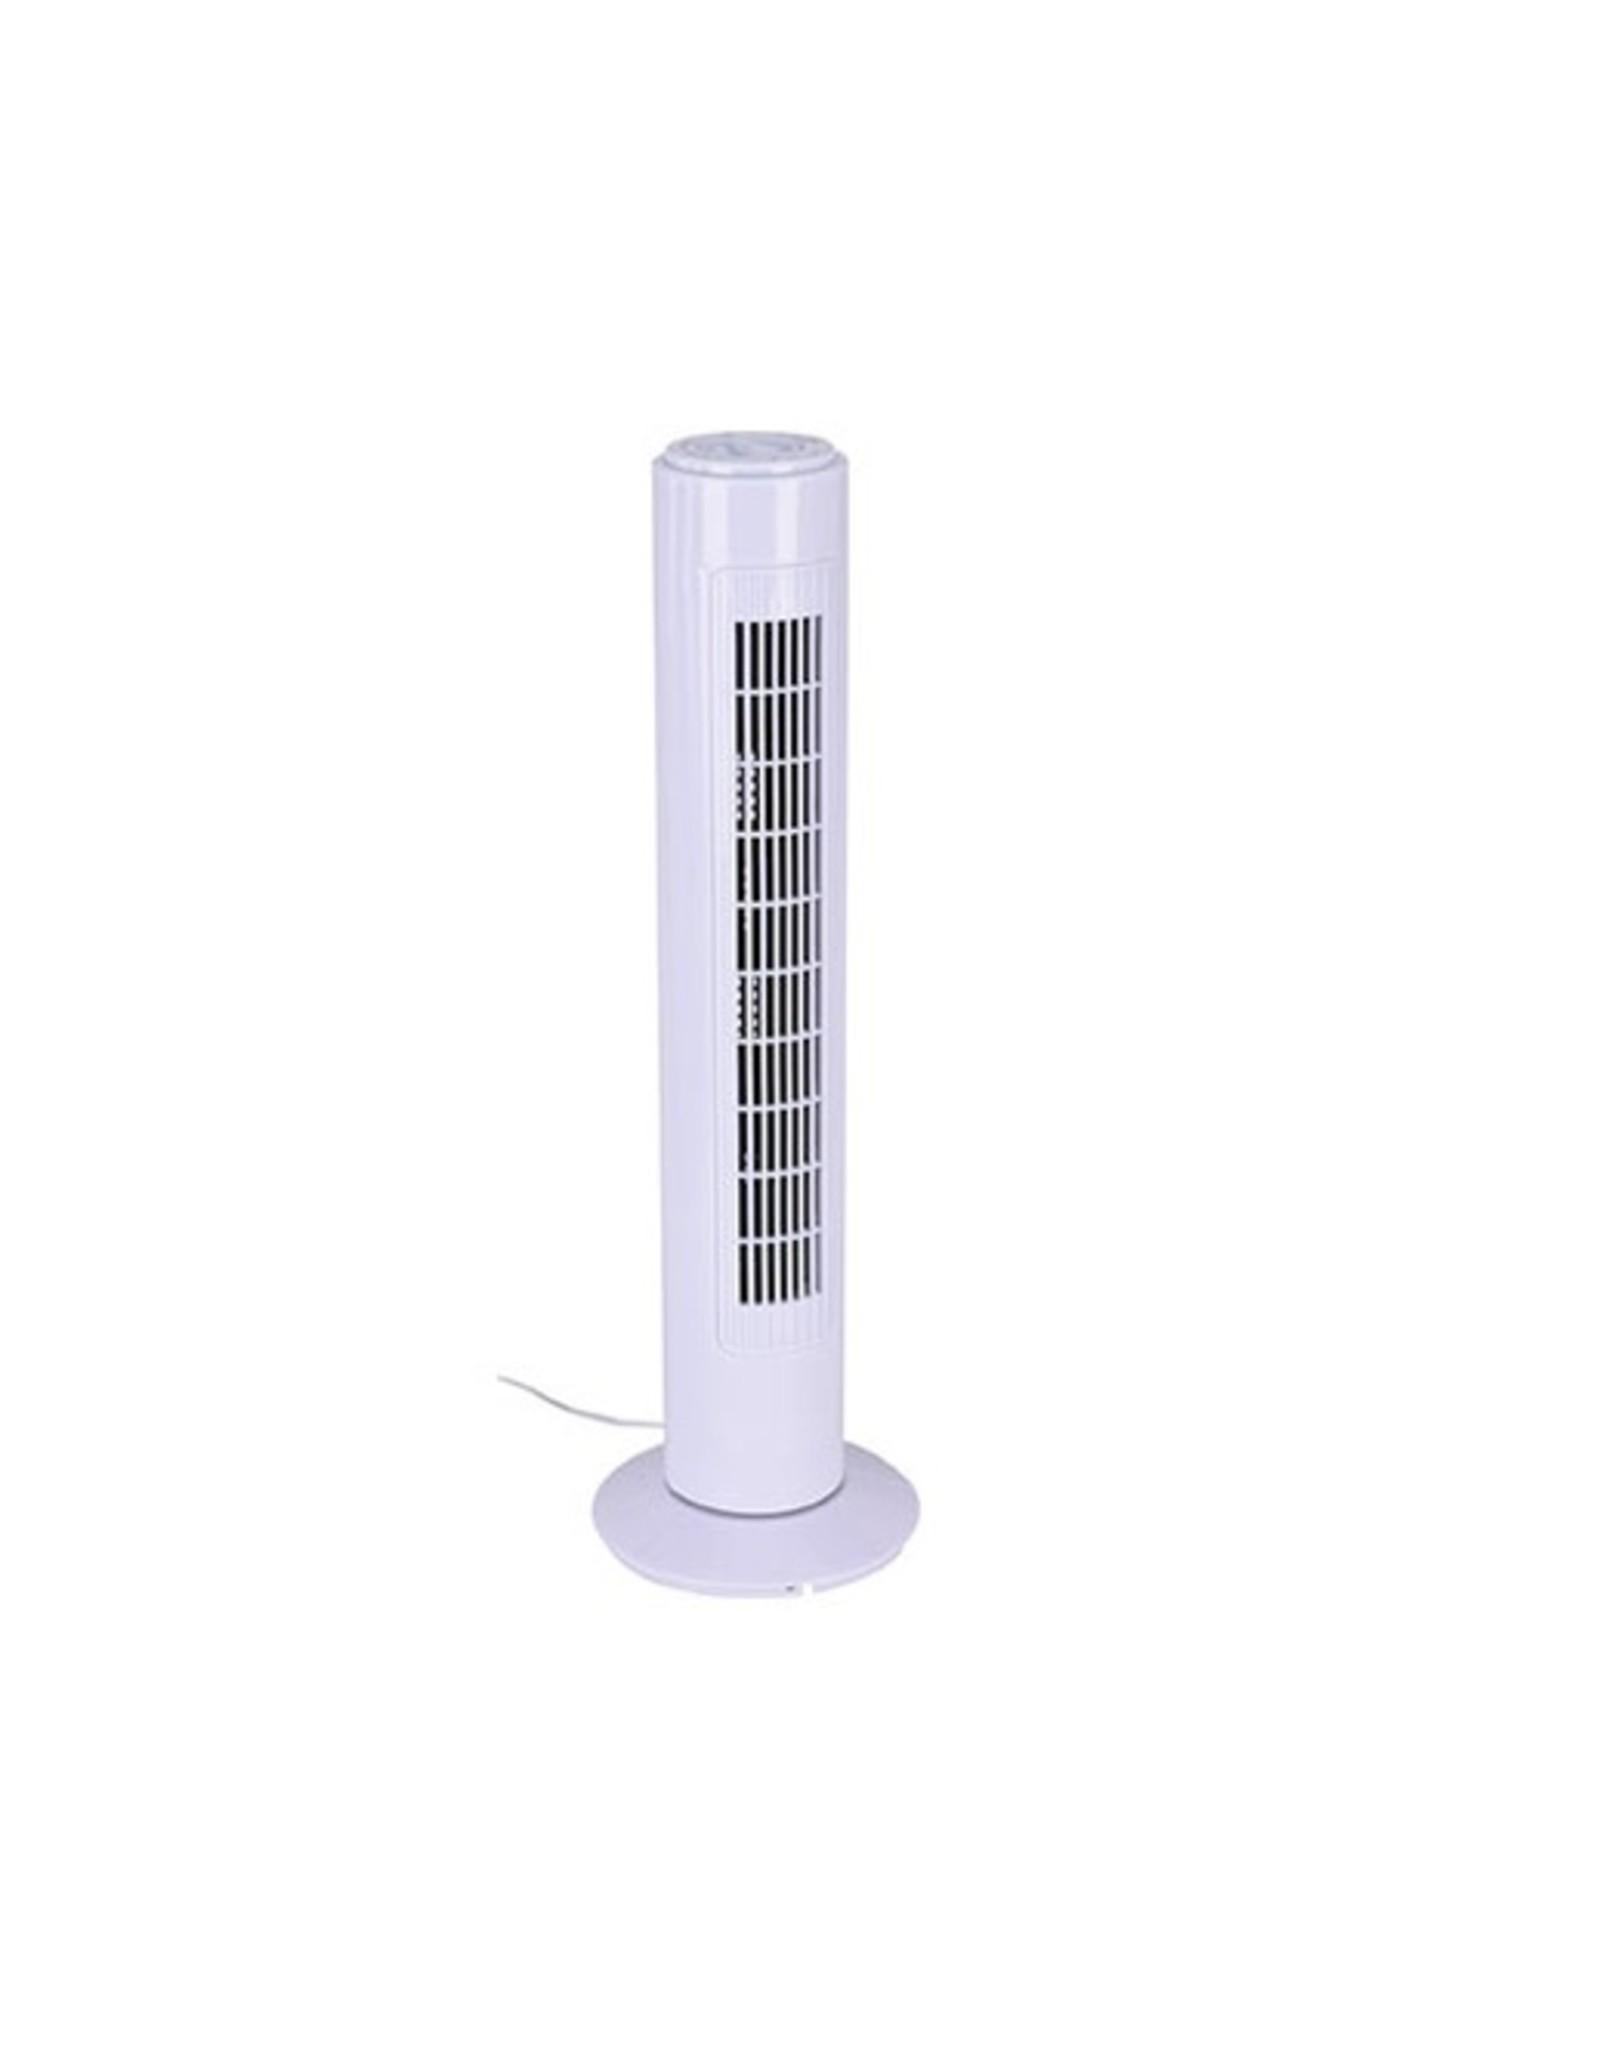 Excellent Electrics - Torenventilator - 73cm - Wit - EV